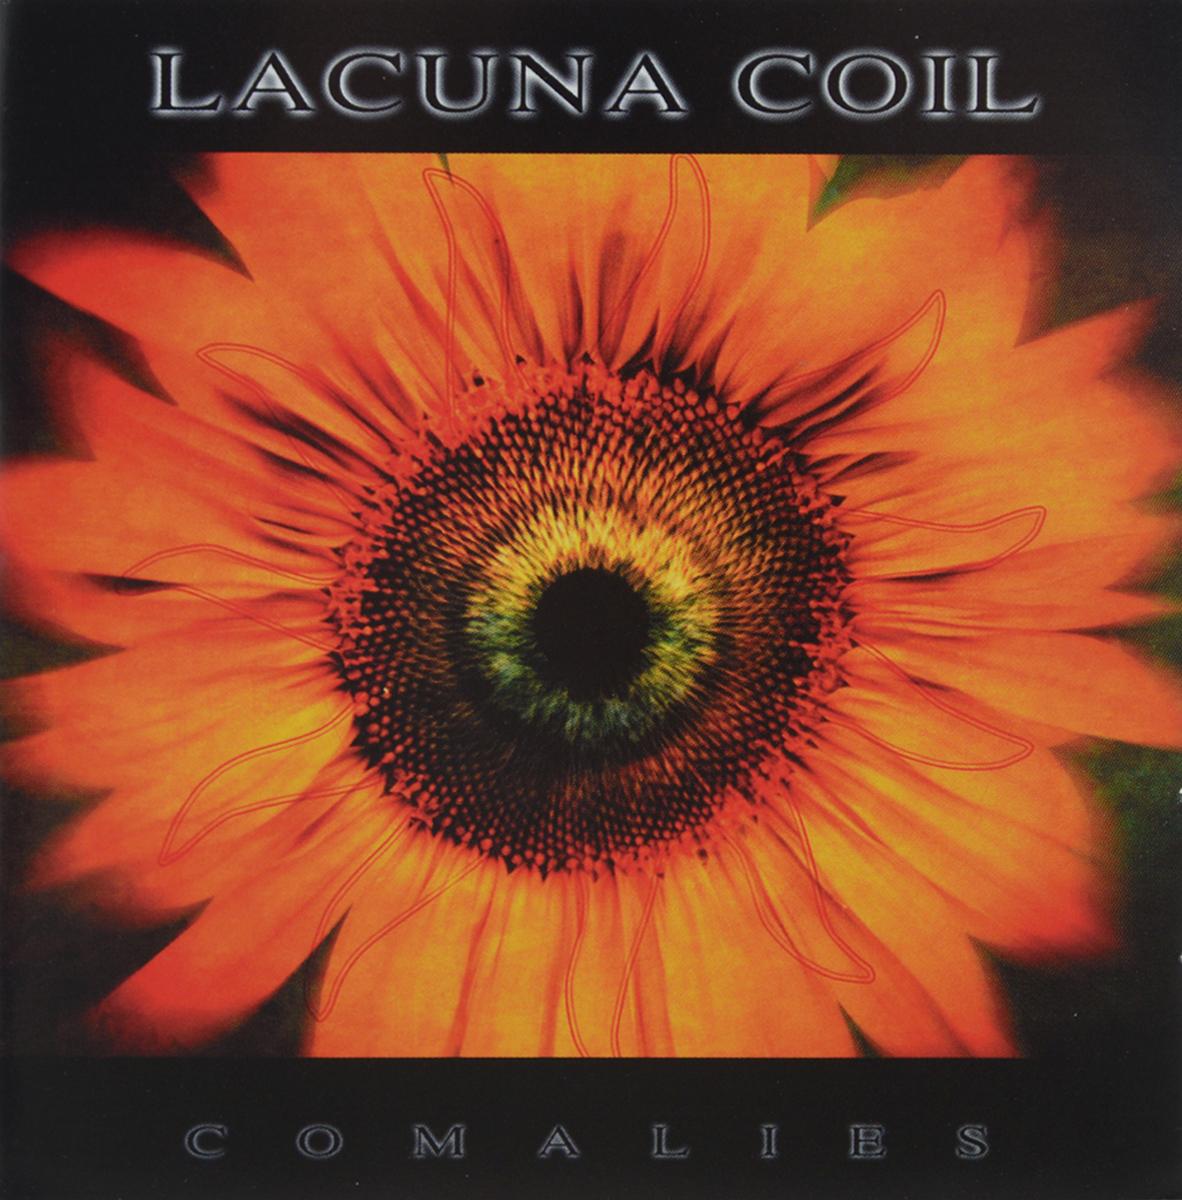 цена на Lacuna Coil Lacuna Coil. Comalies (2 CD)